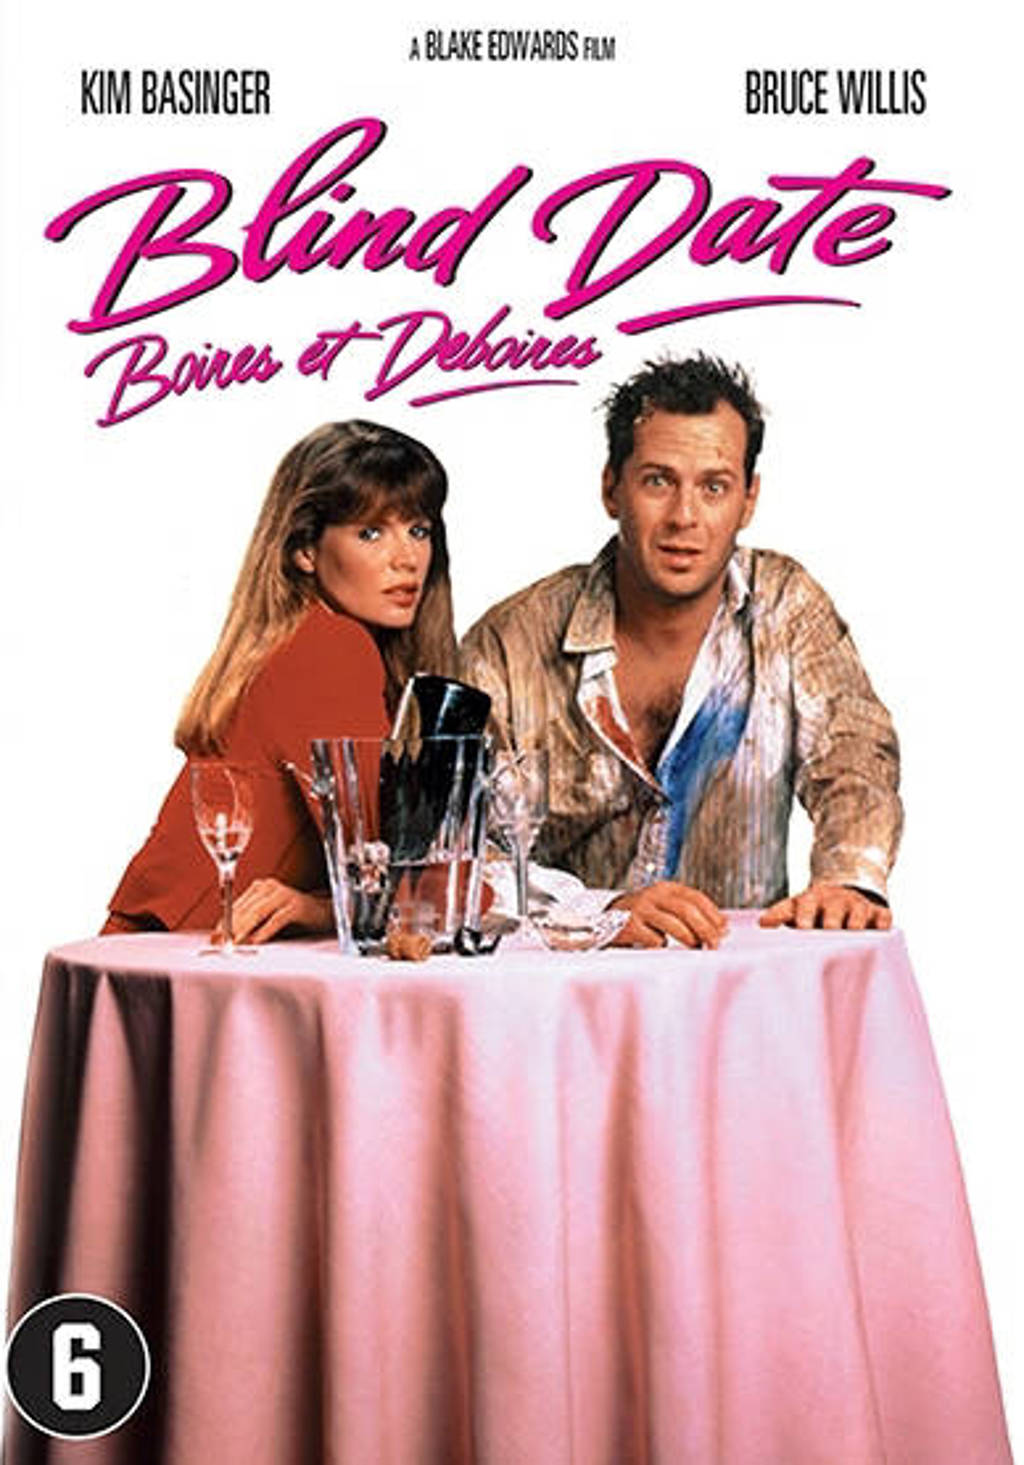 Blind date (1987) (DVD)